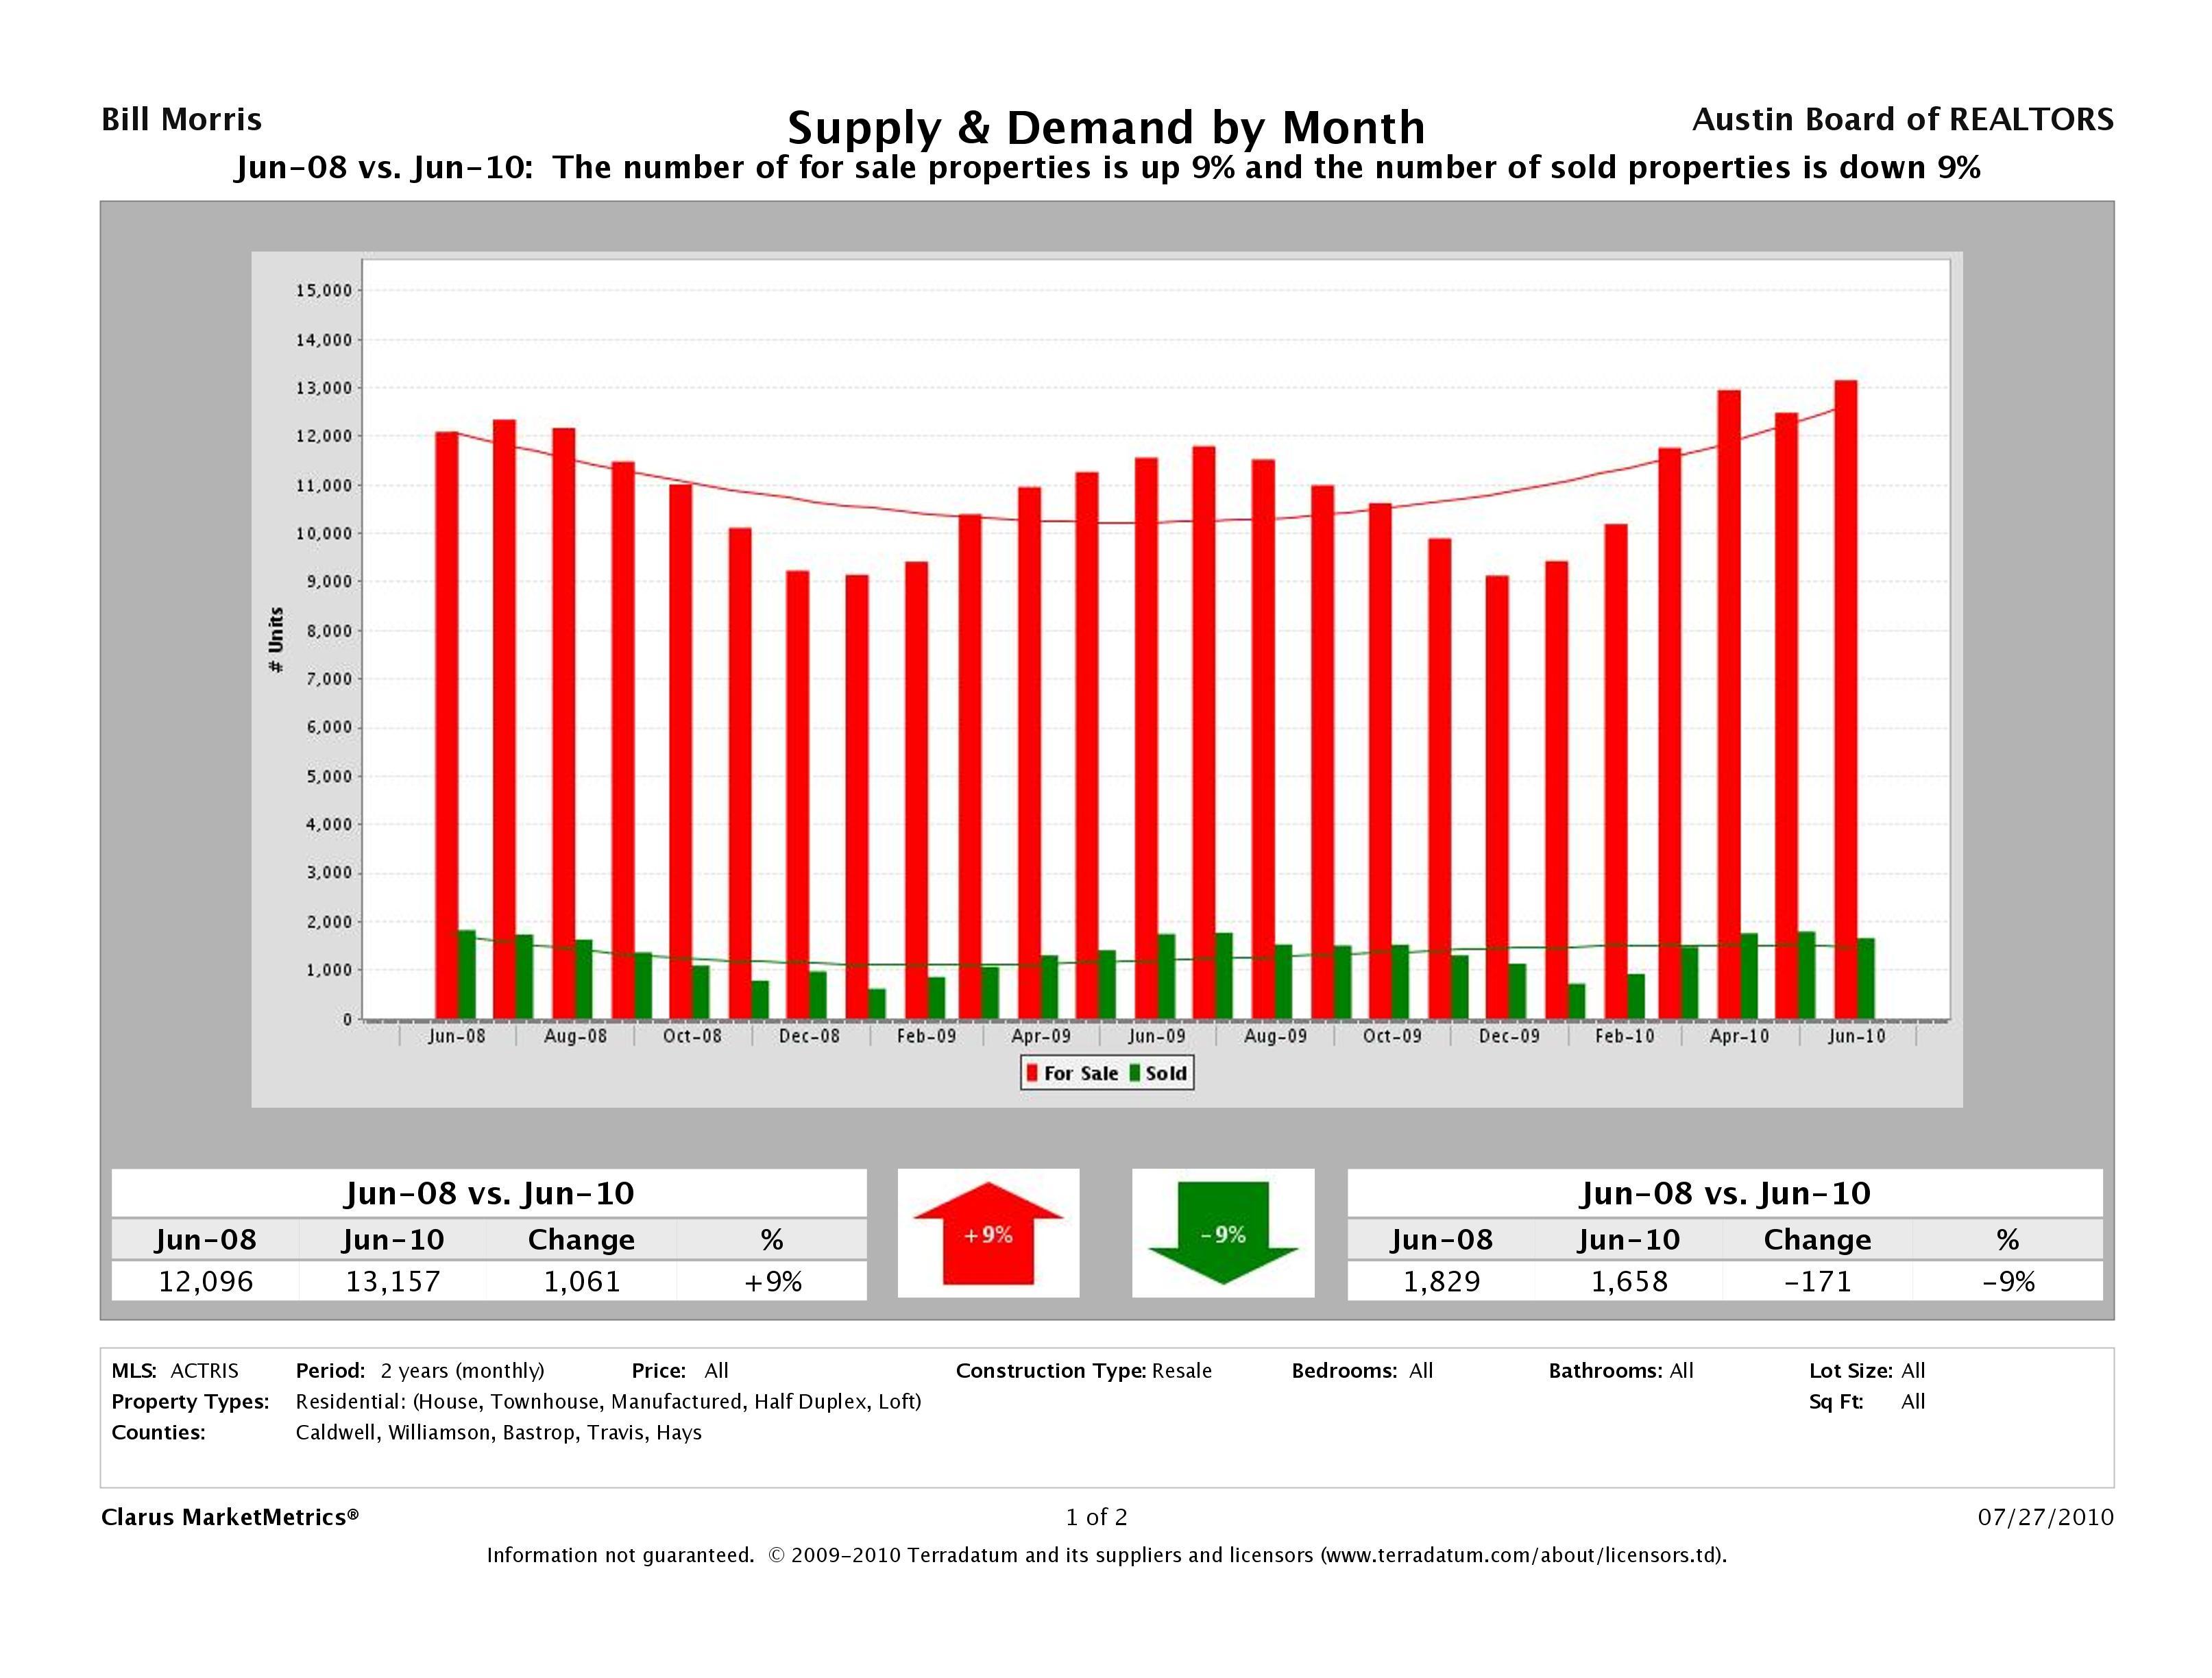 Austin Resale Supply and Demand June 2008 - June 2010